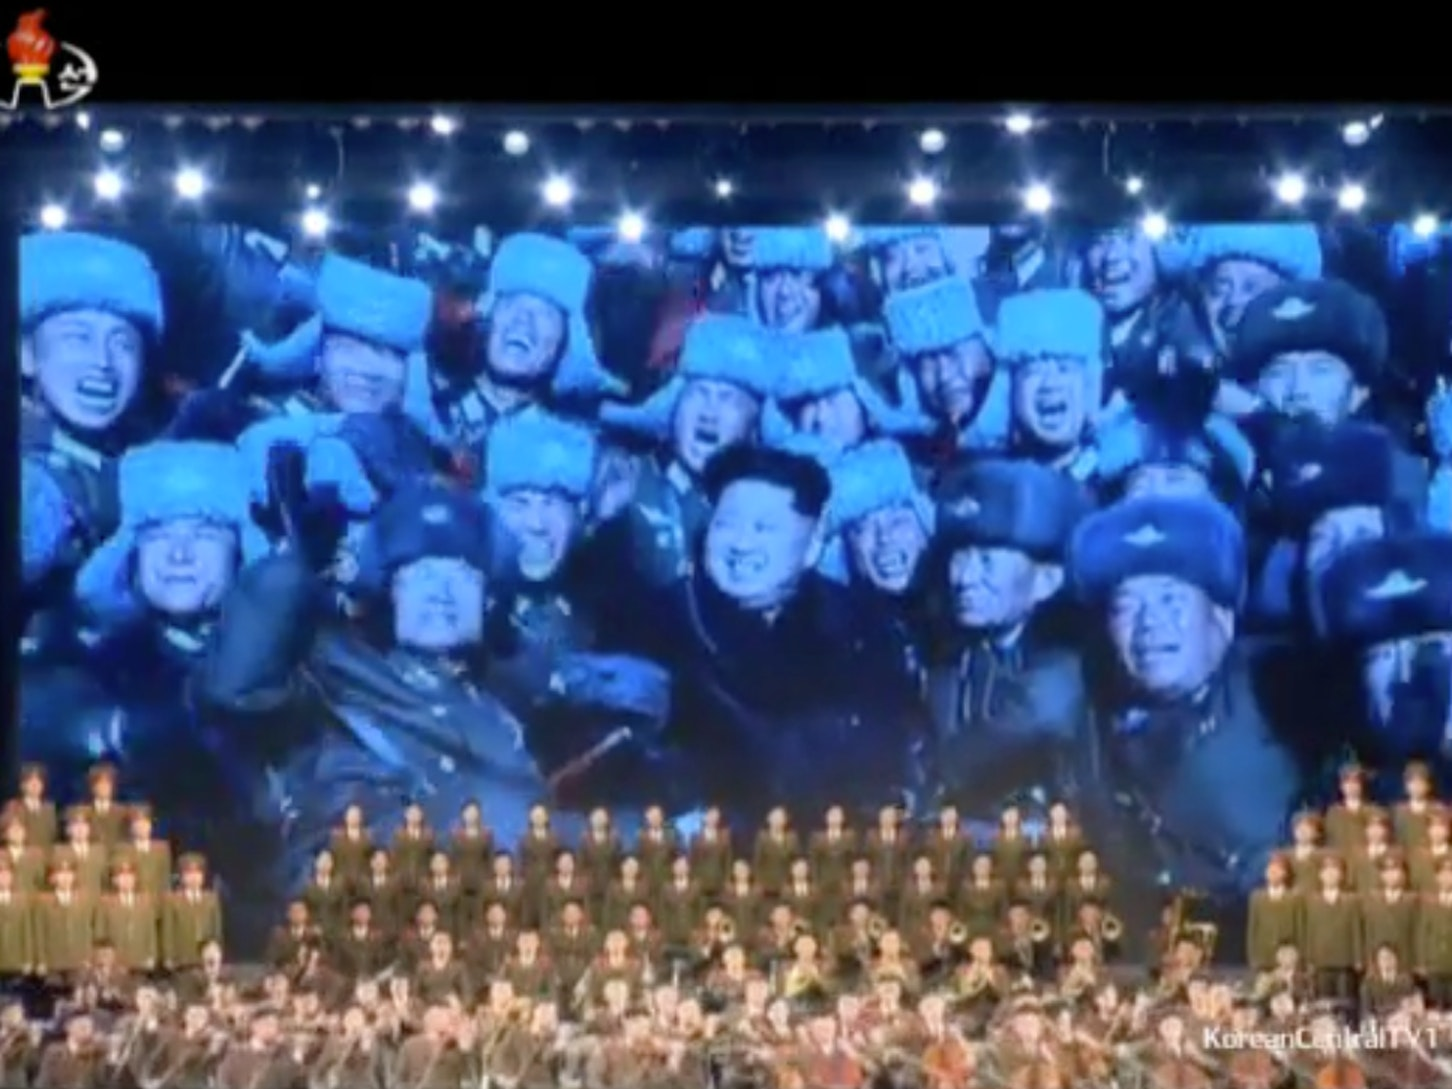 A symphony plays the new Anthem for Kim Jong-un.